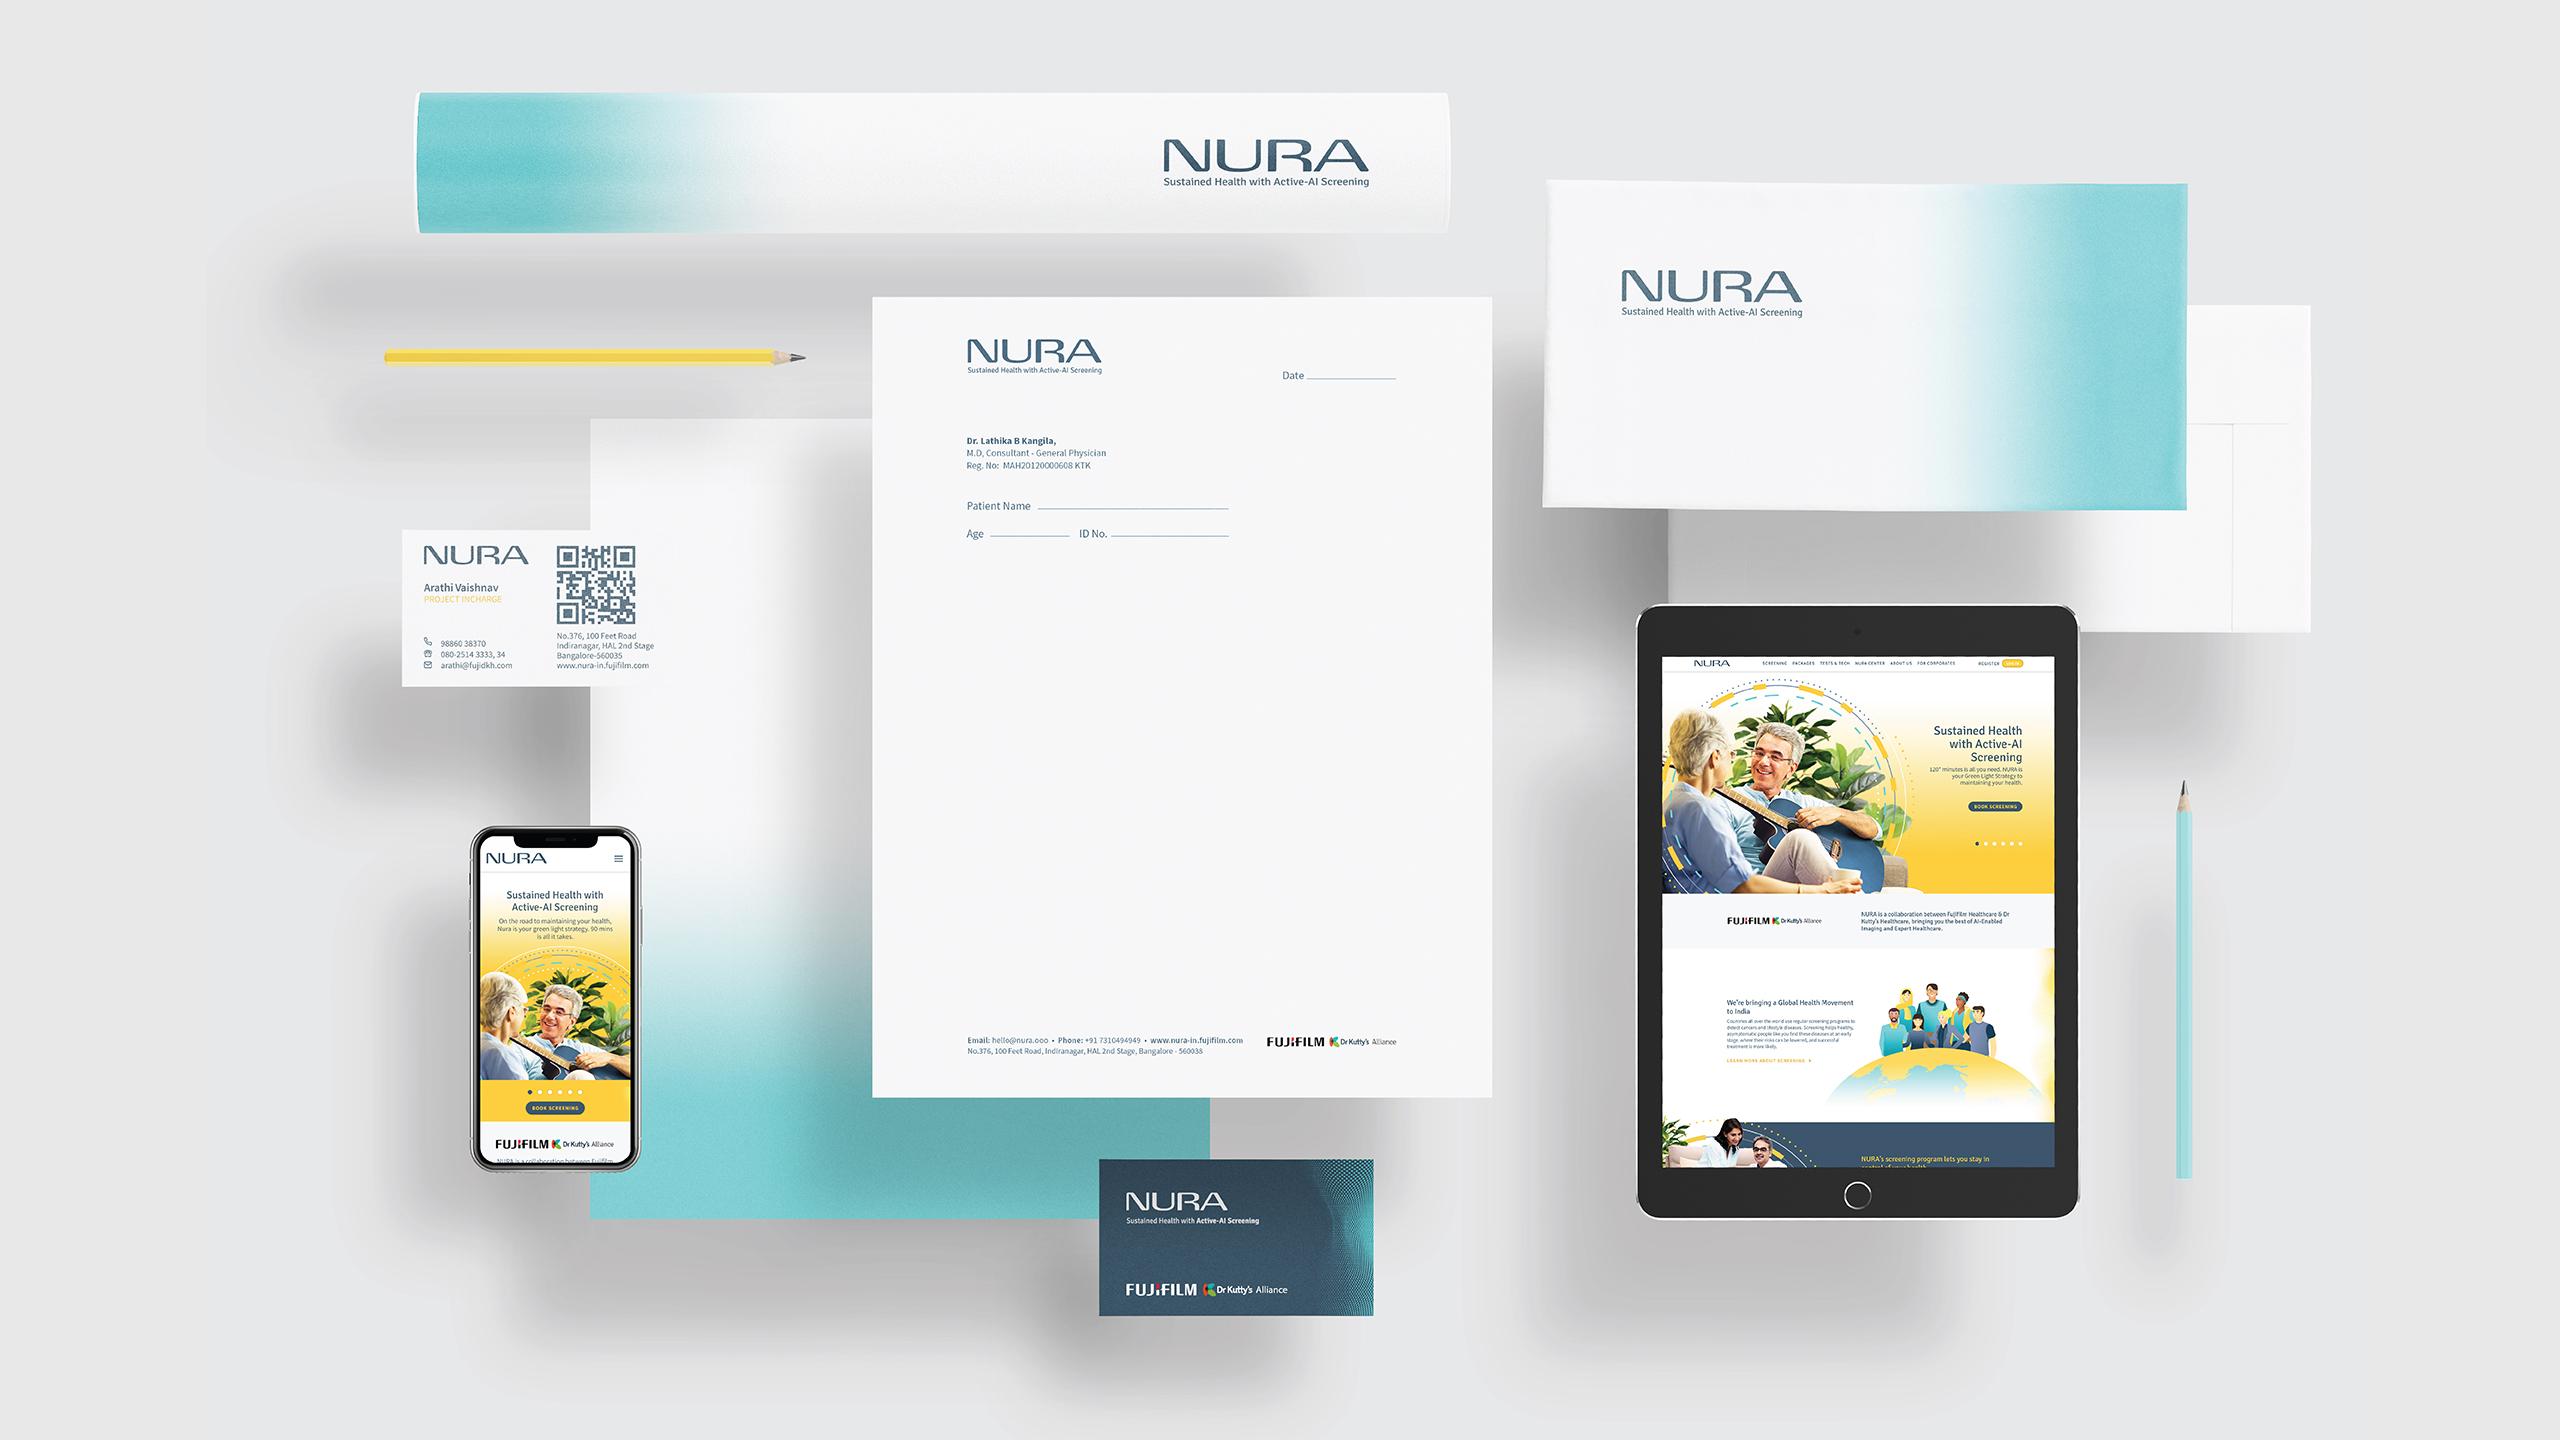 Nura2